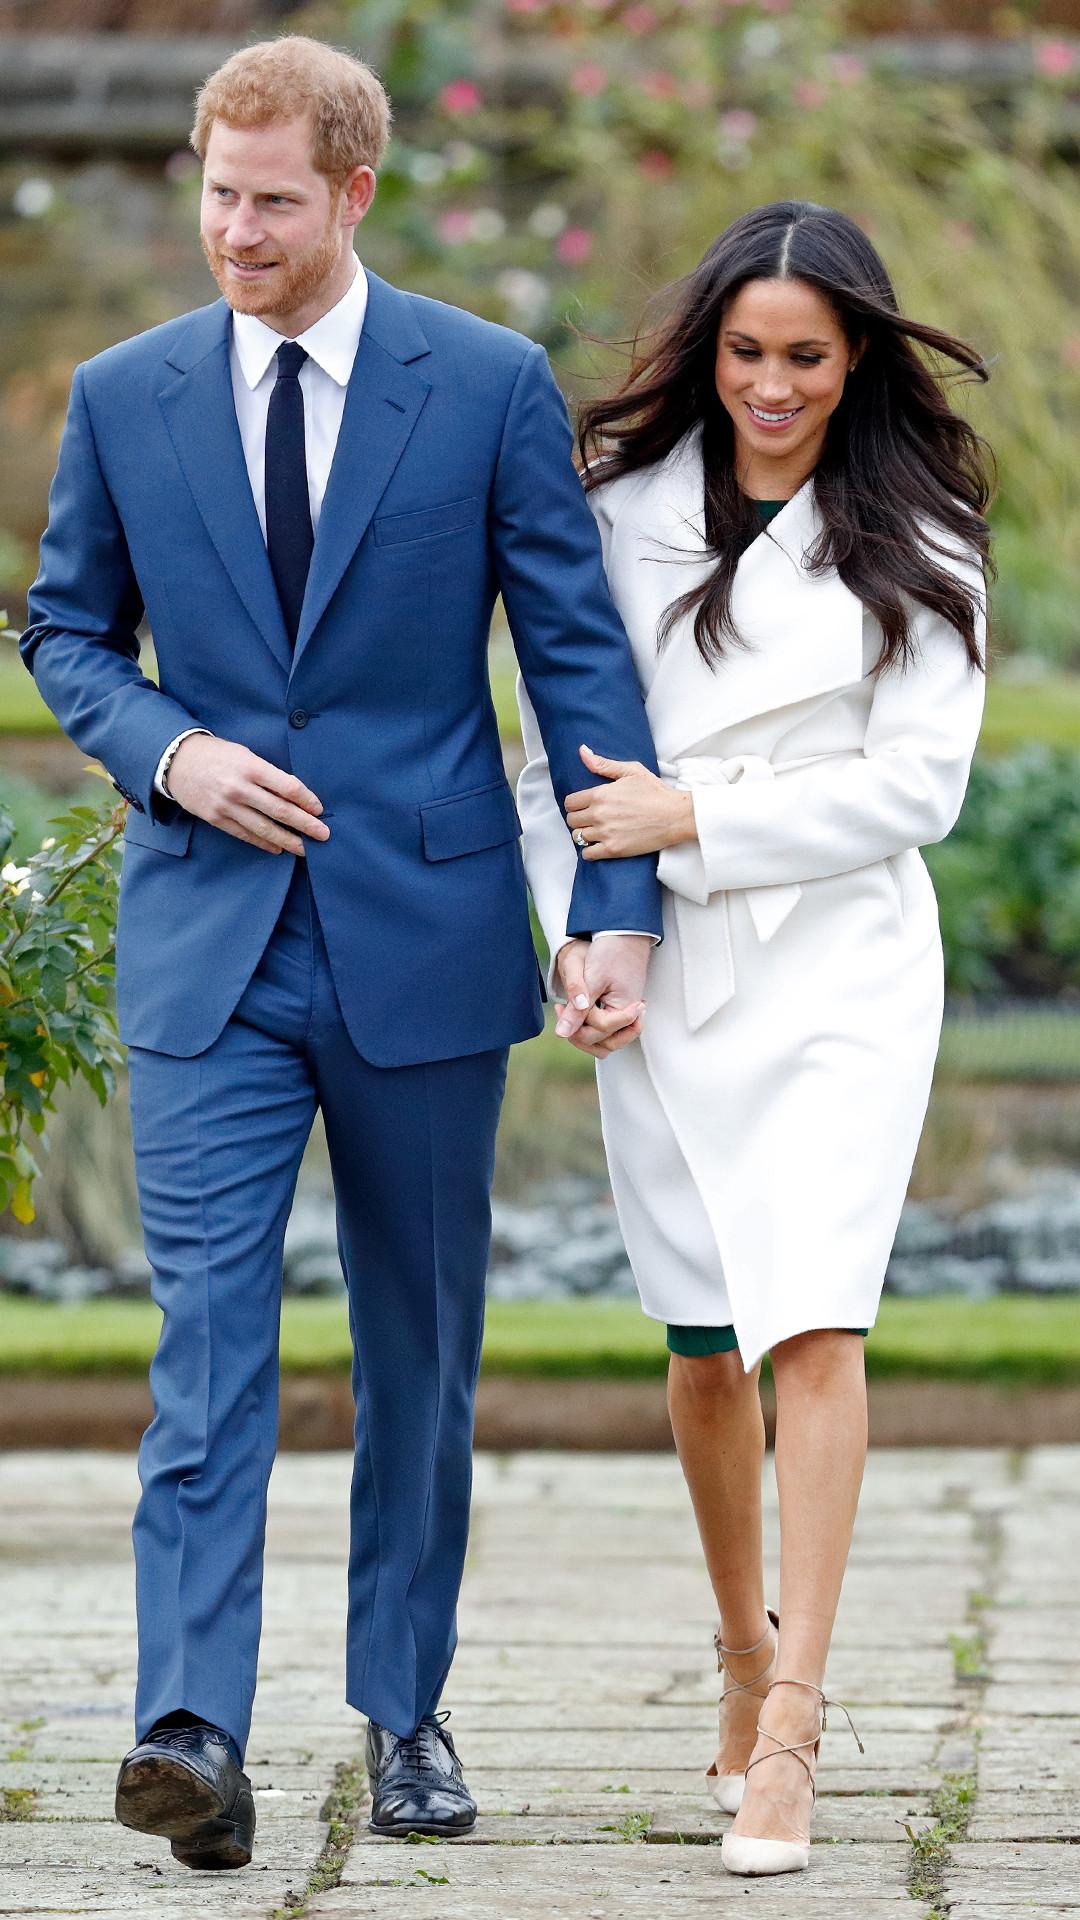 ESC: Prince Harry, Meghan Markle